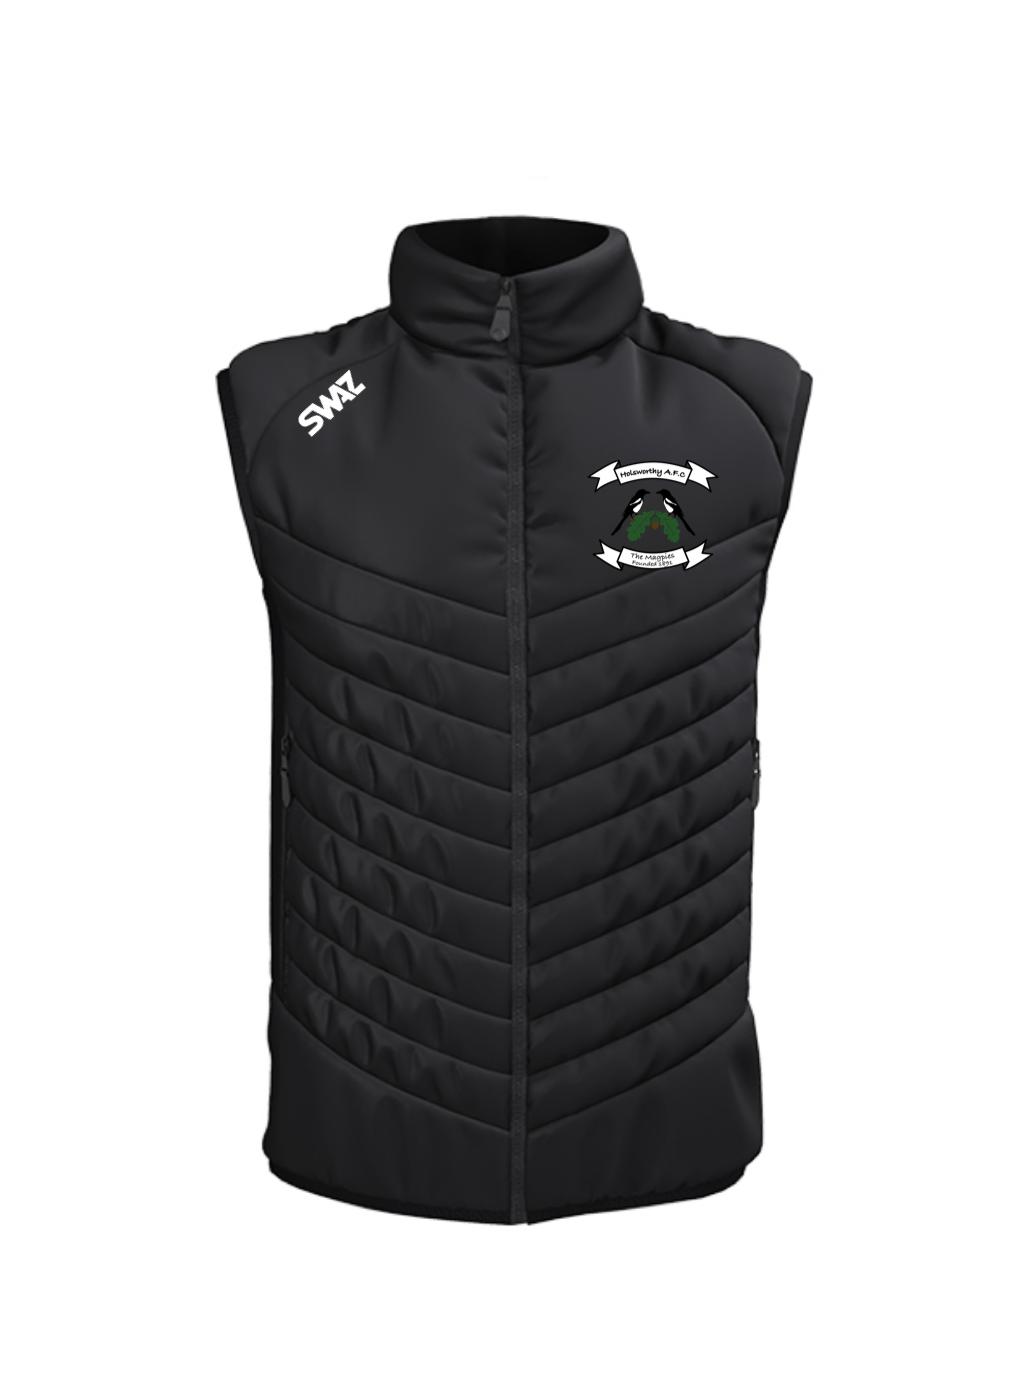 Holsworthy AFC Gilet | SWAZ Teamwear | Football Kit Supplier